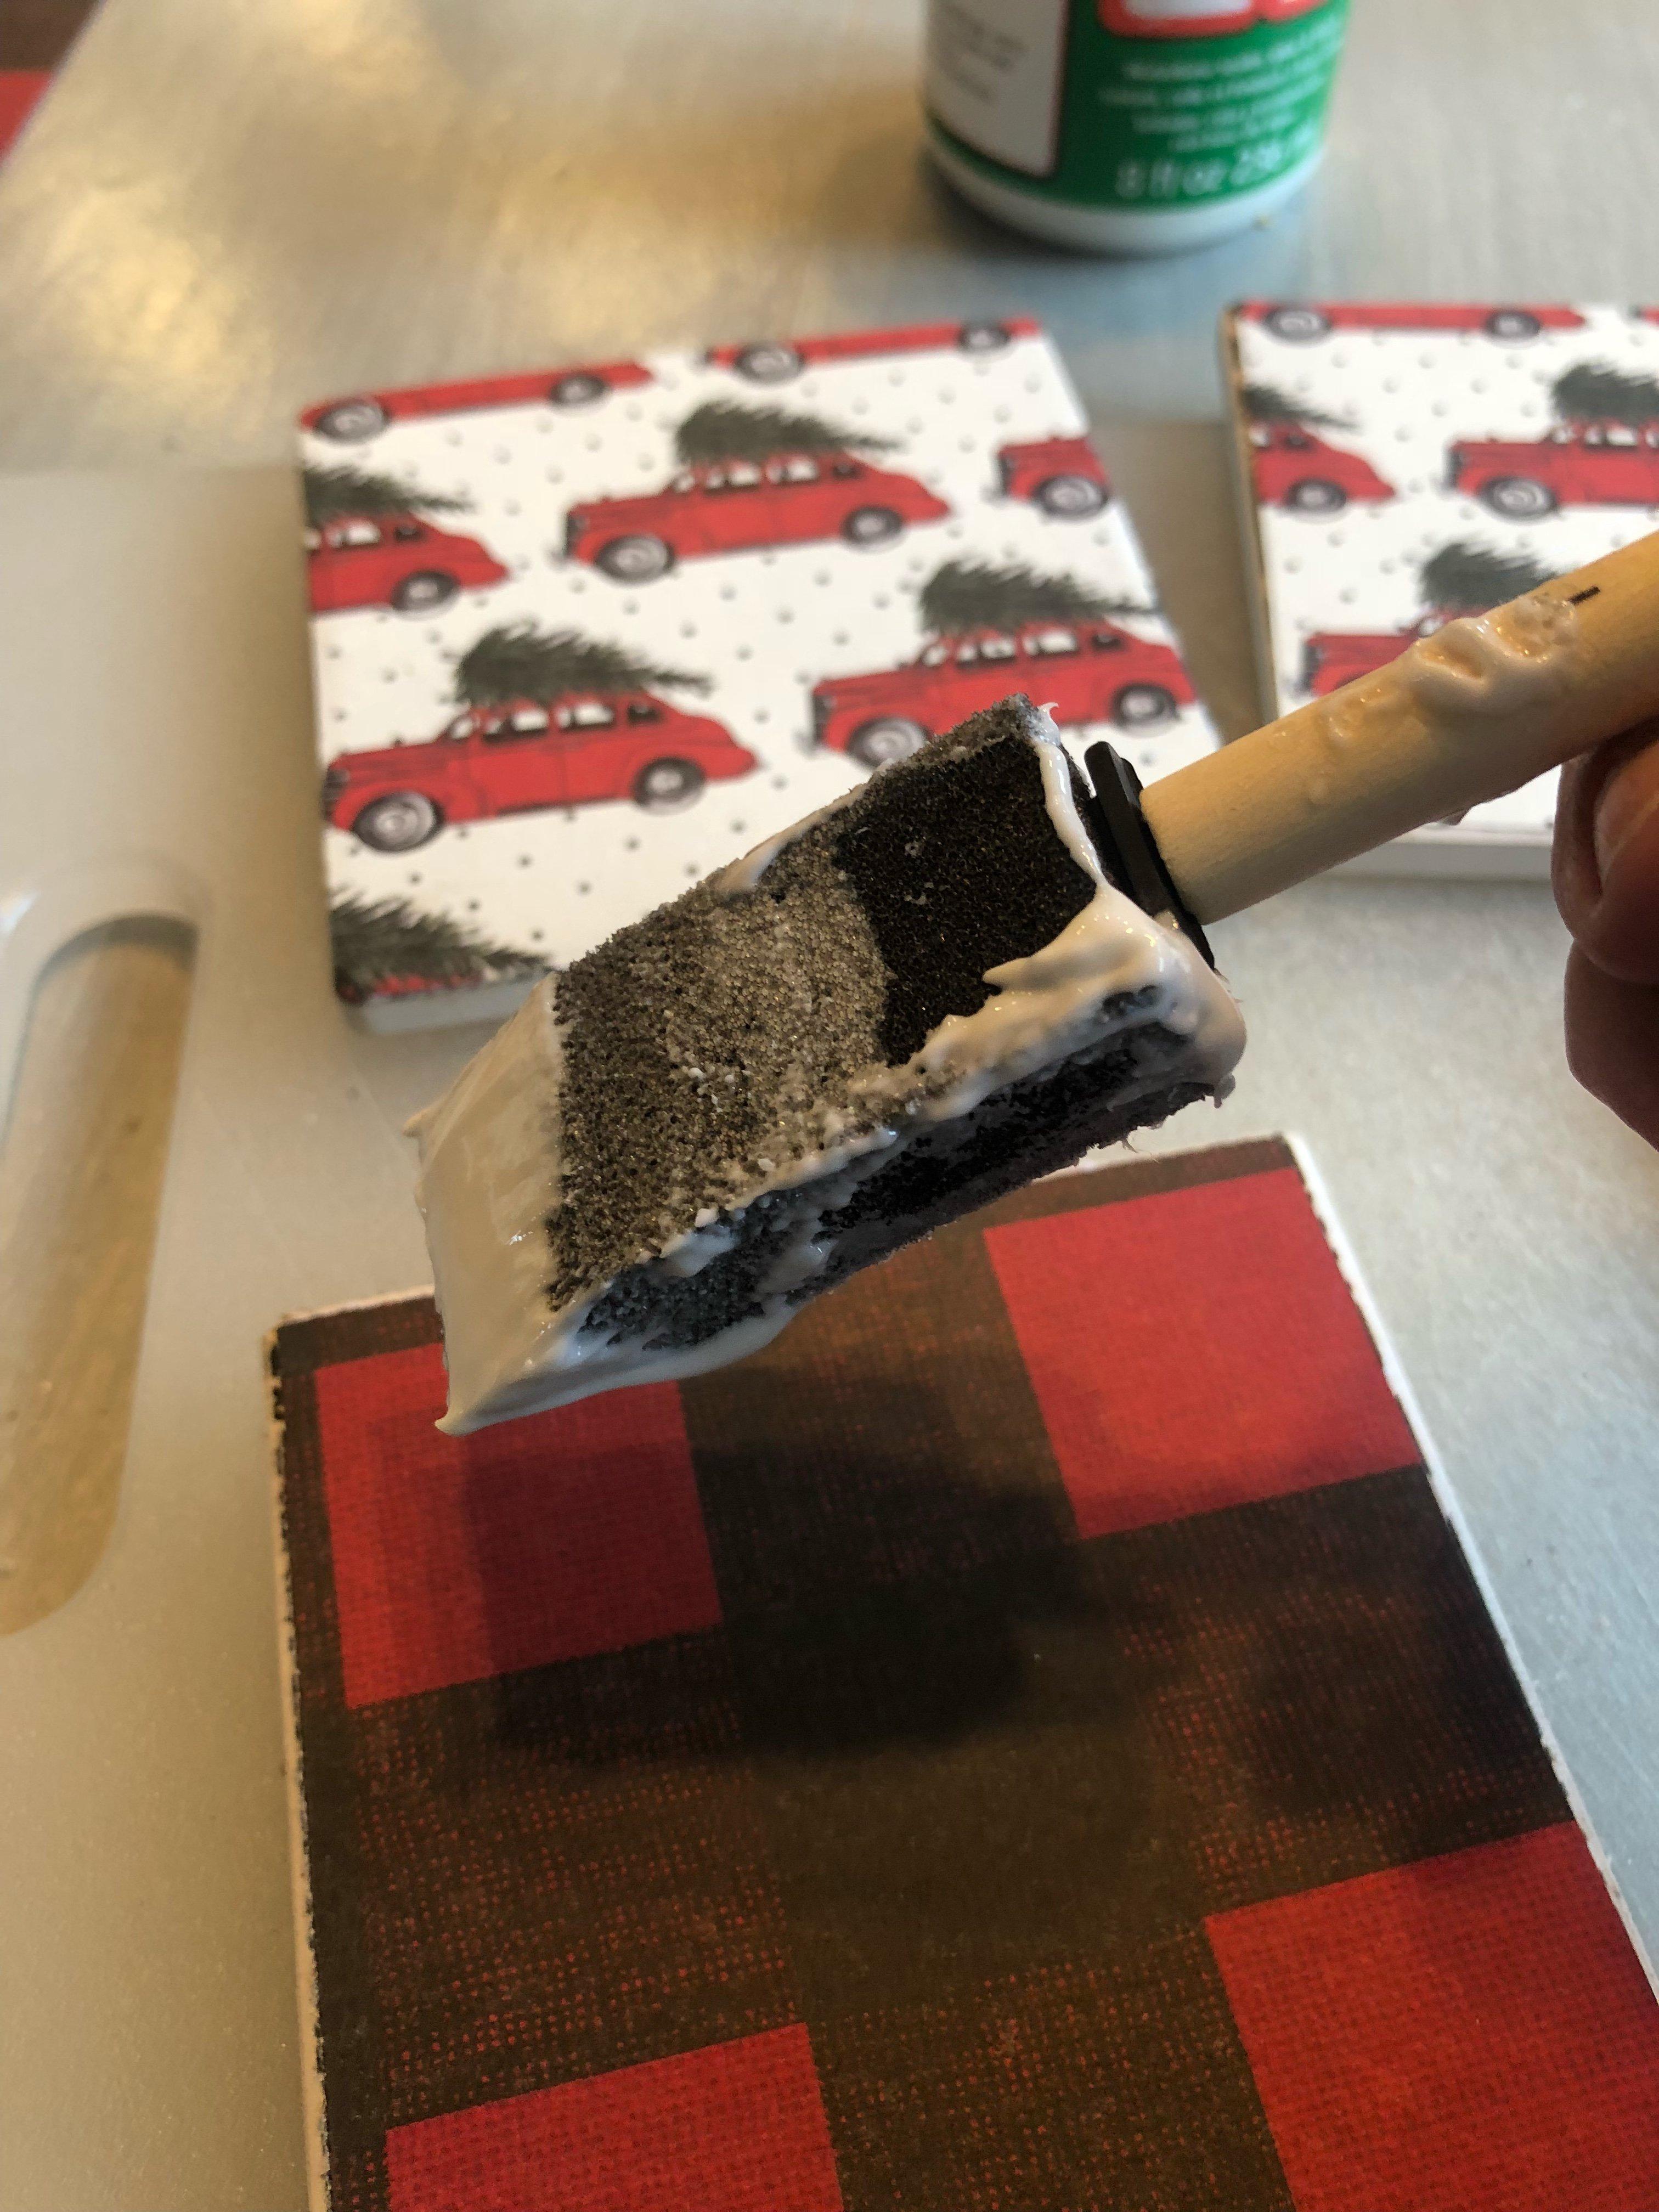 DIY Christmas coasters using scrapbook paper